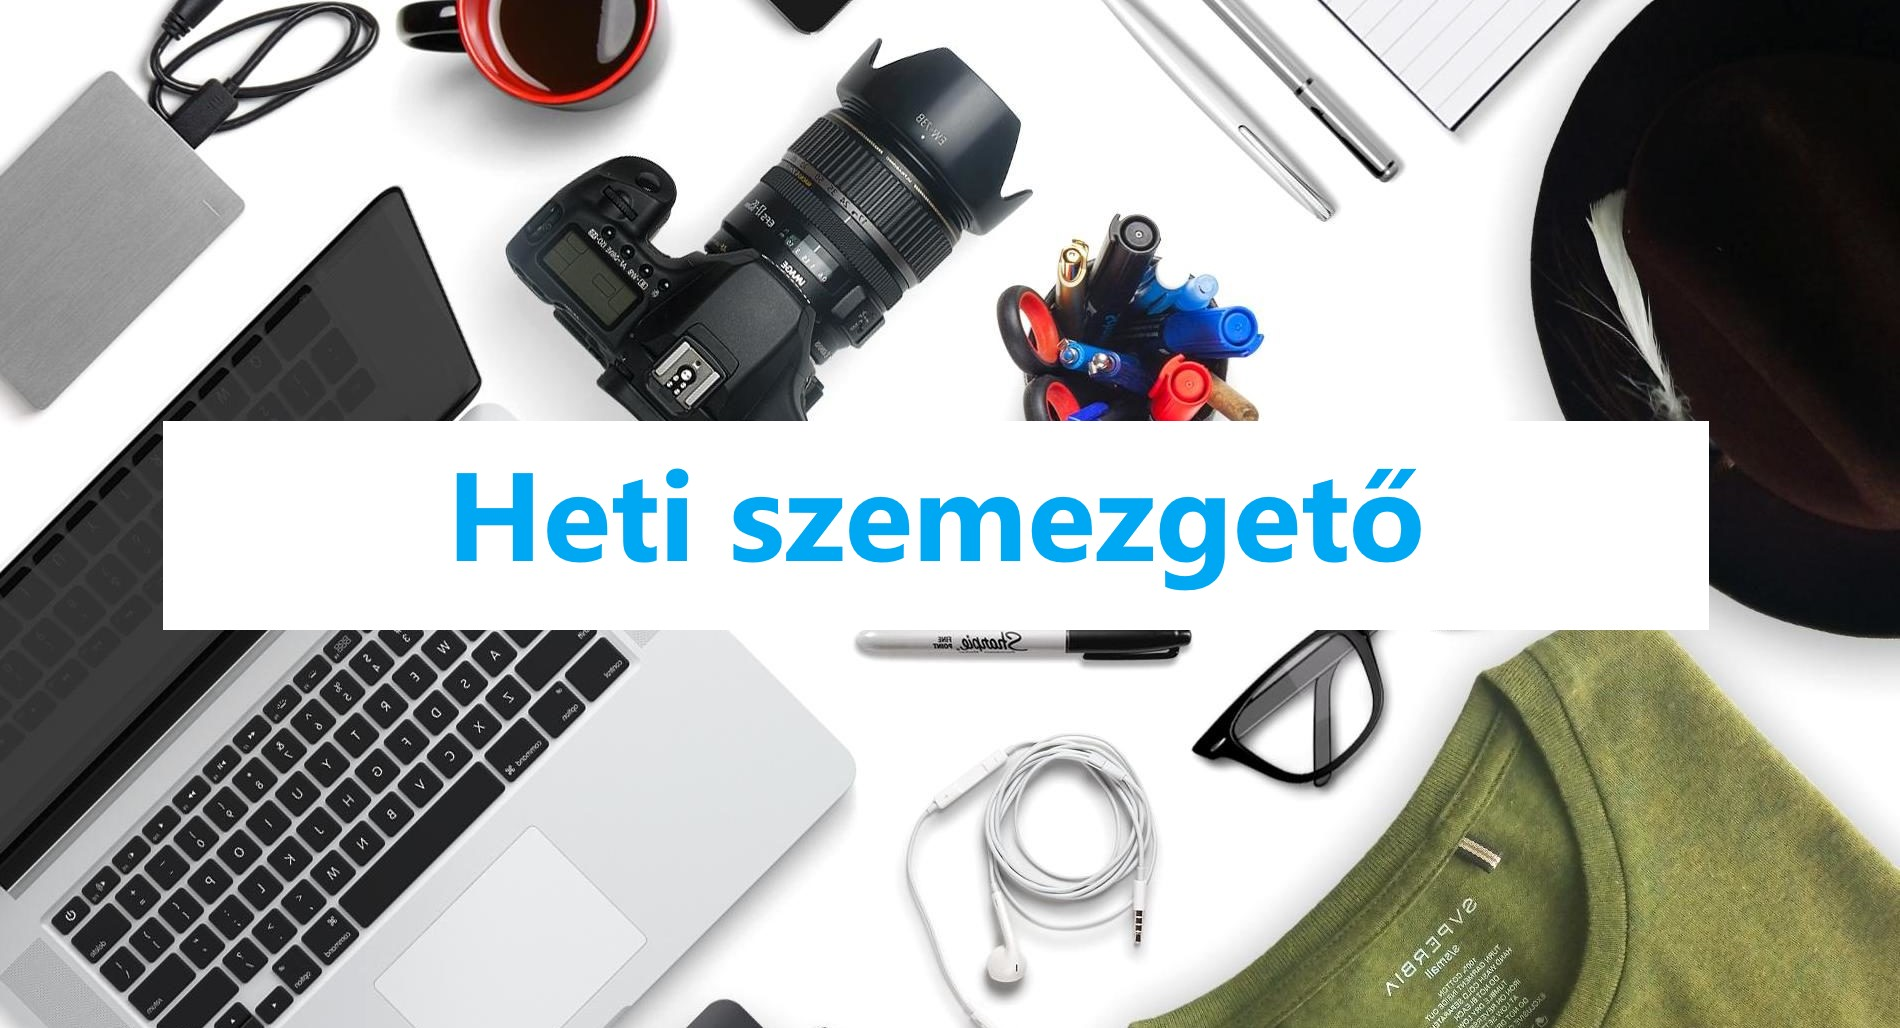 heti_szemezgeto_uj_29.jpg